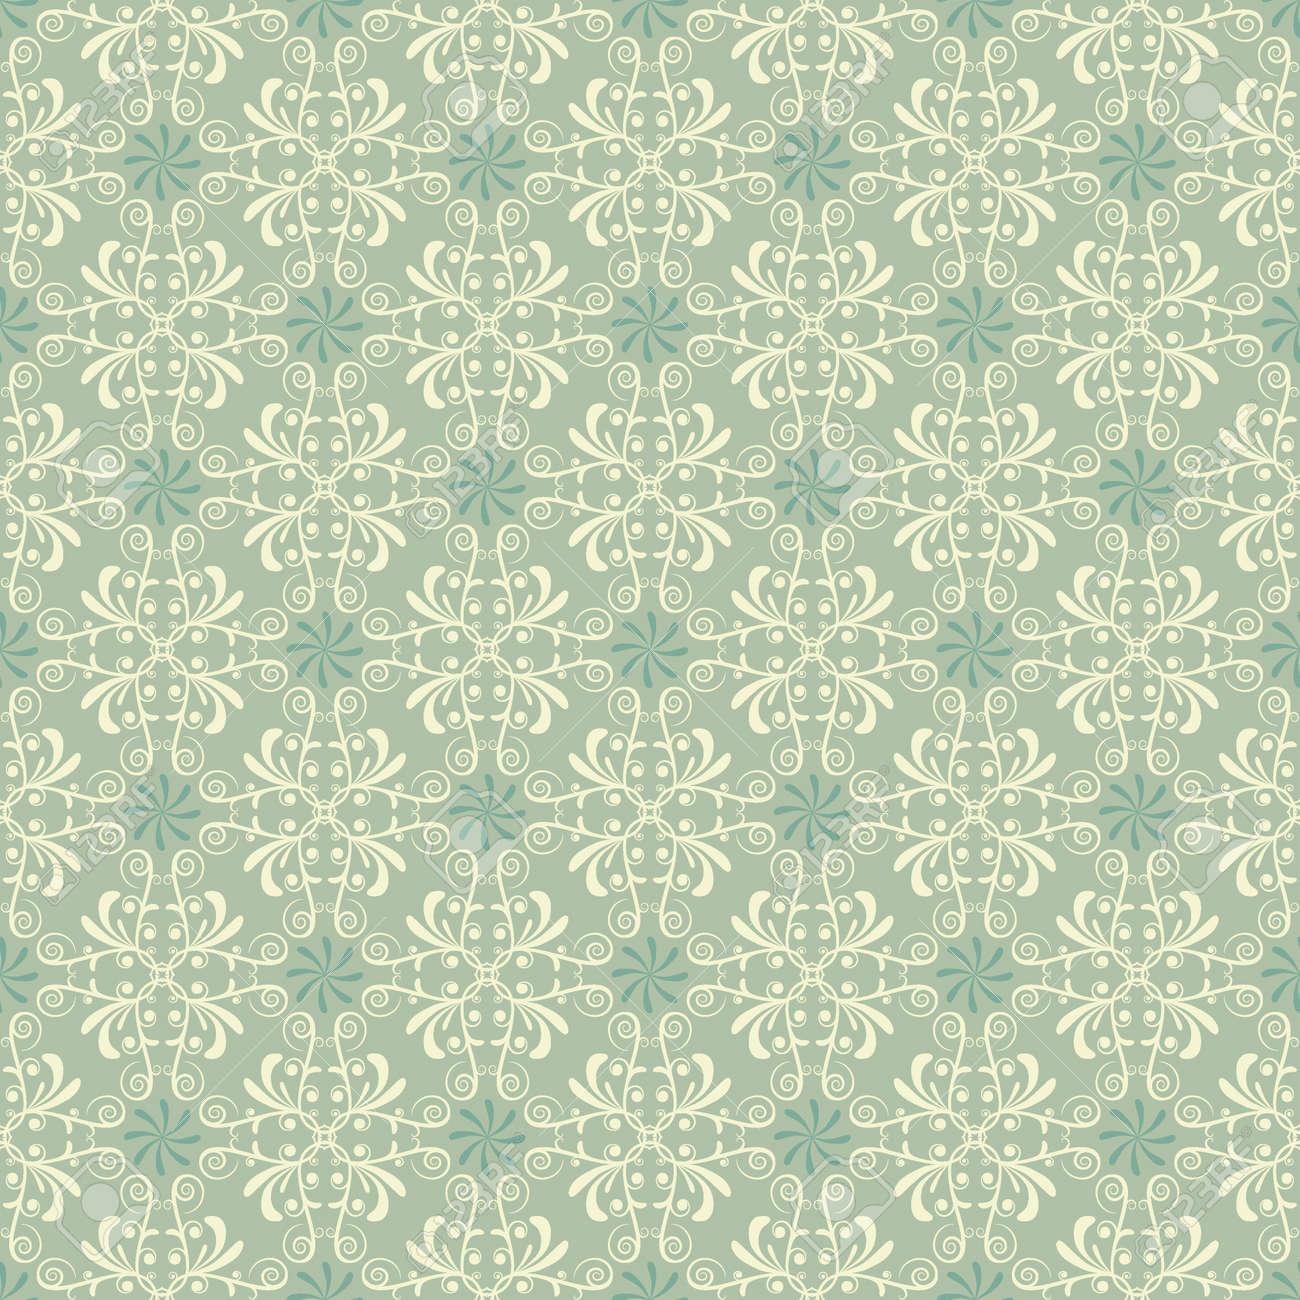 muster tapeten in zarten grnen standard bild 16590721 - Muster Tapeten